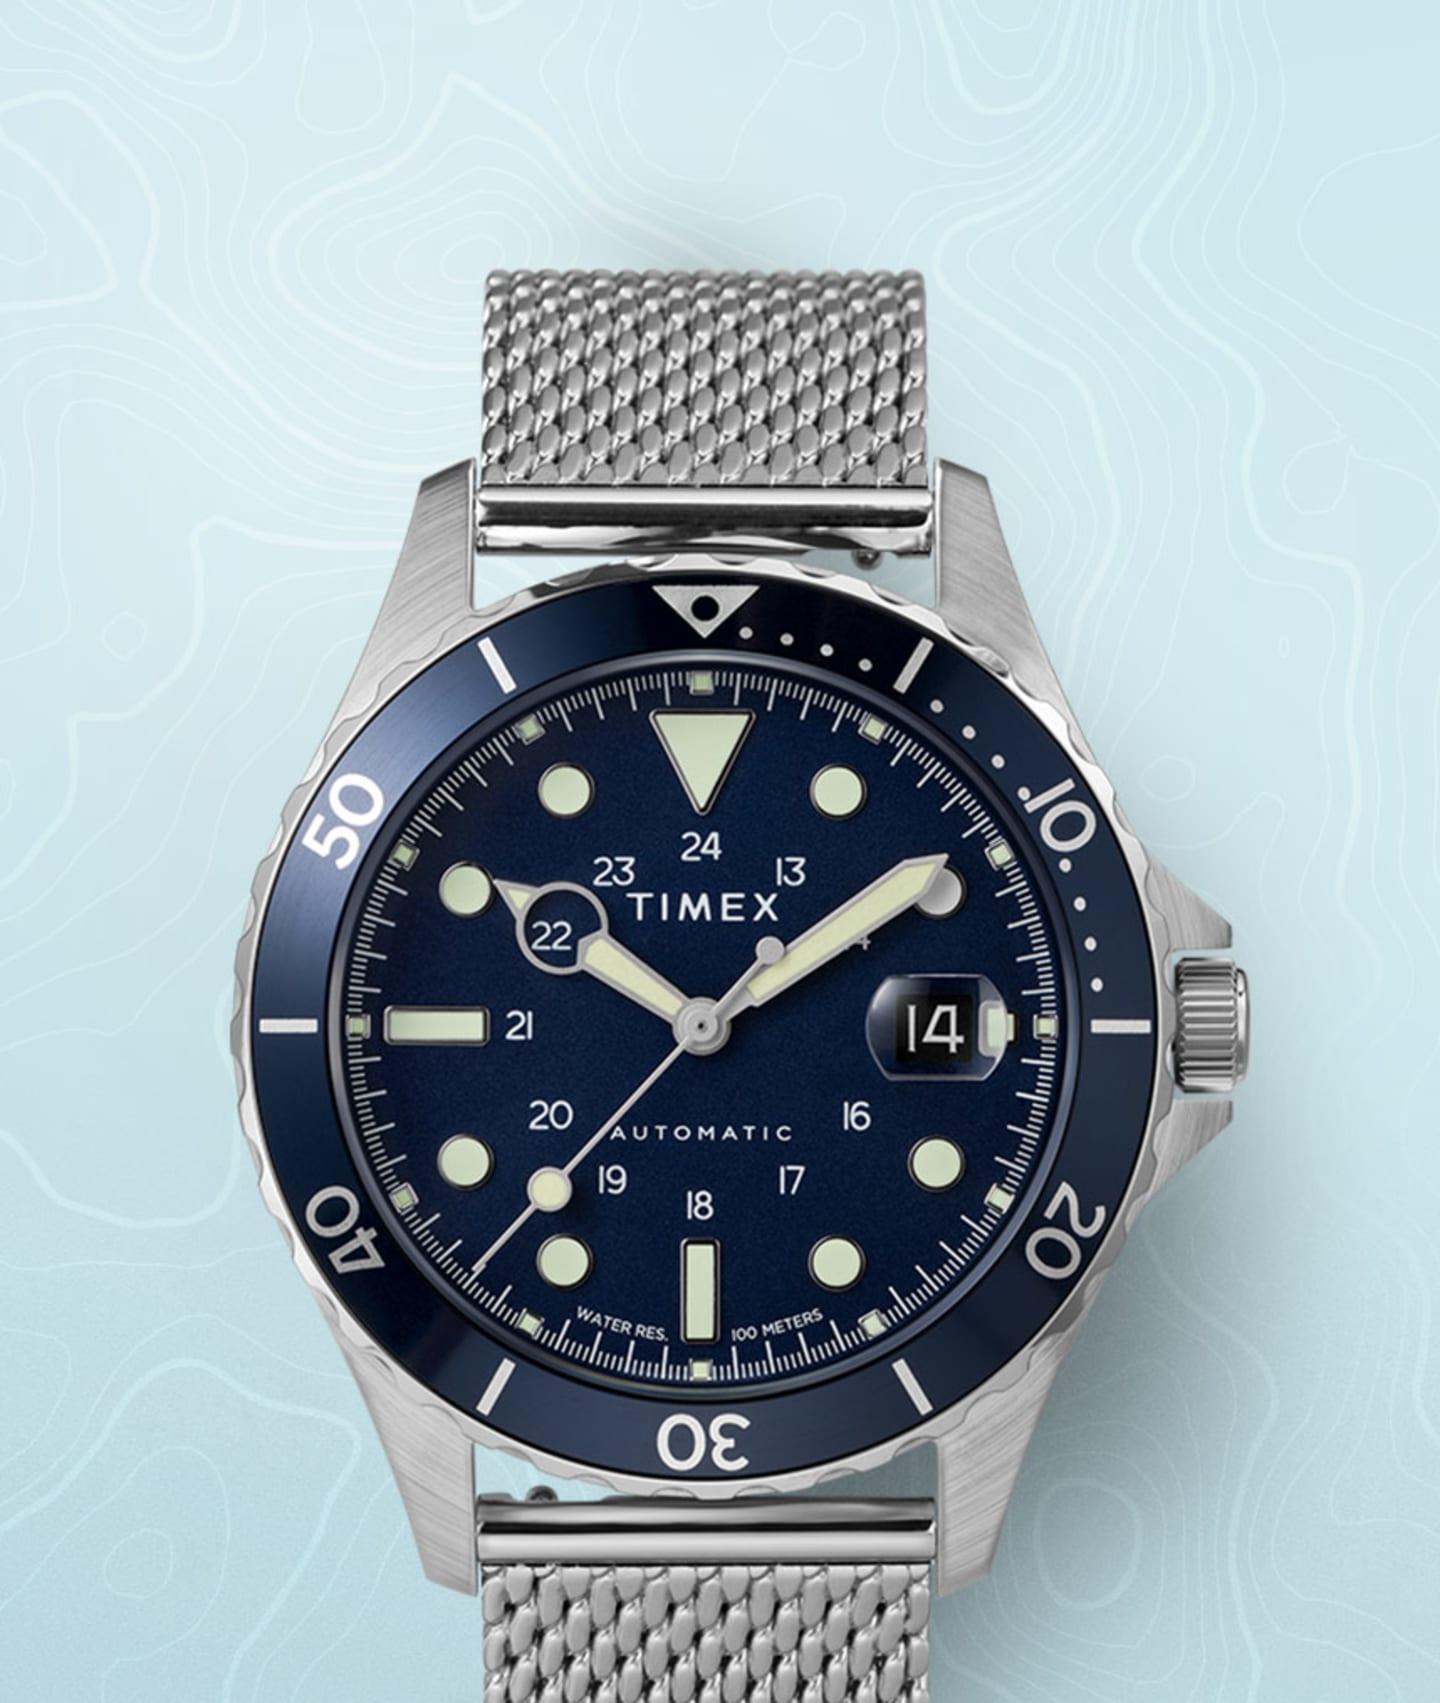 Marlin Automatic Uhr.